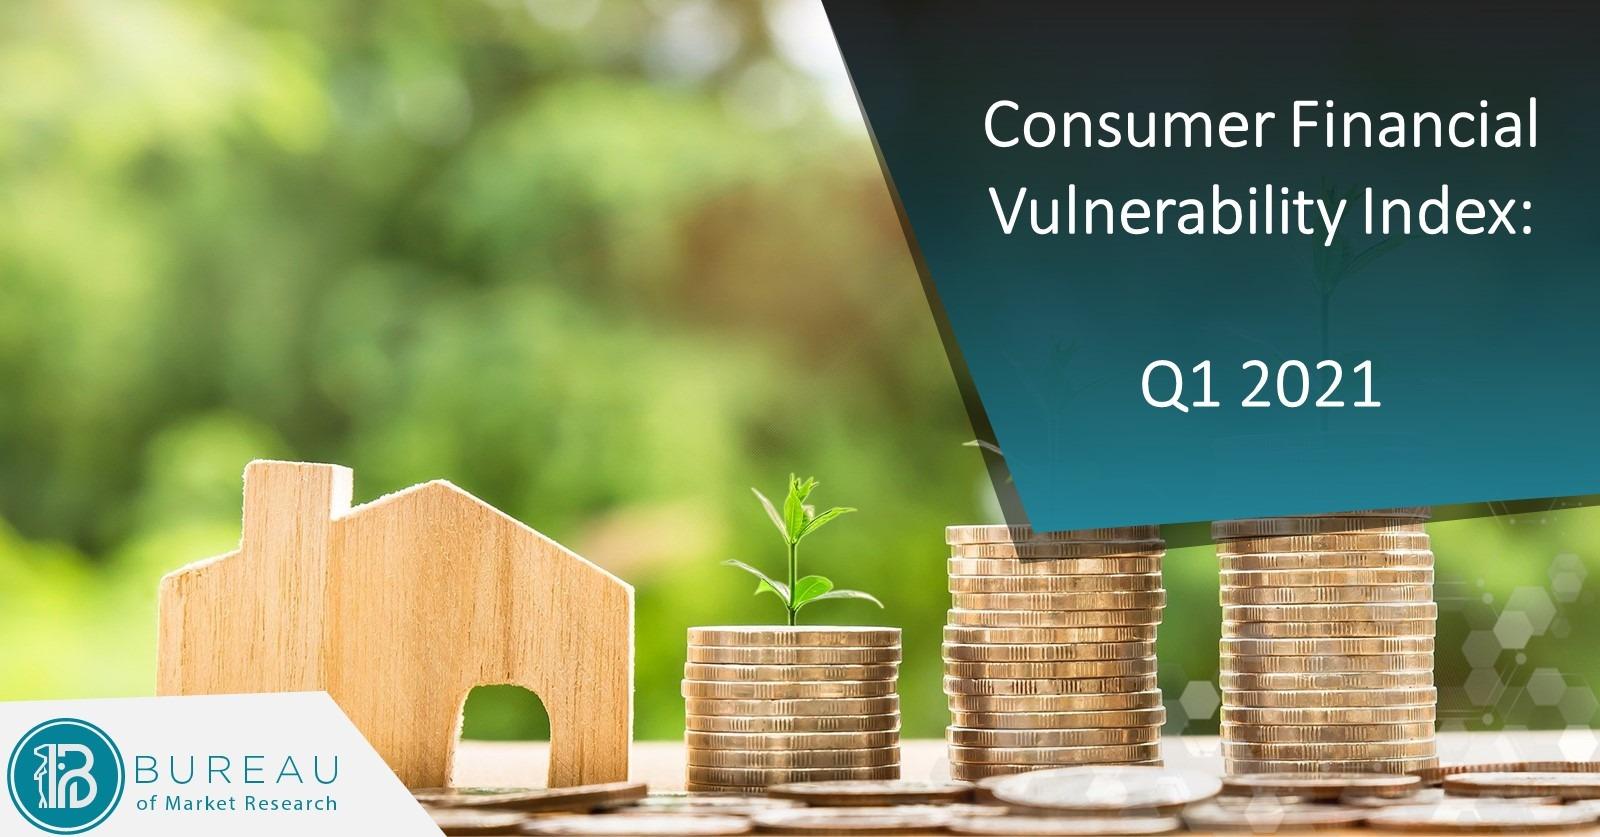 CONSUMER FINANCIAL VULNERABILITY INDEX: Q1 2021